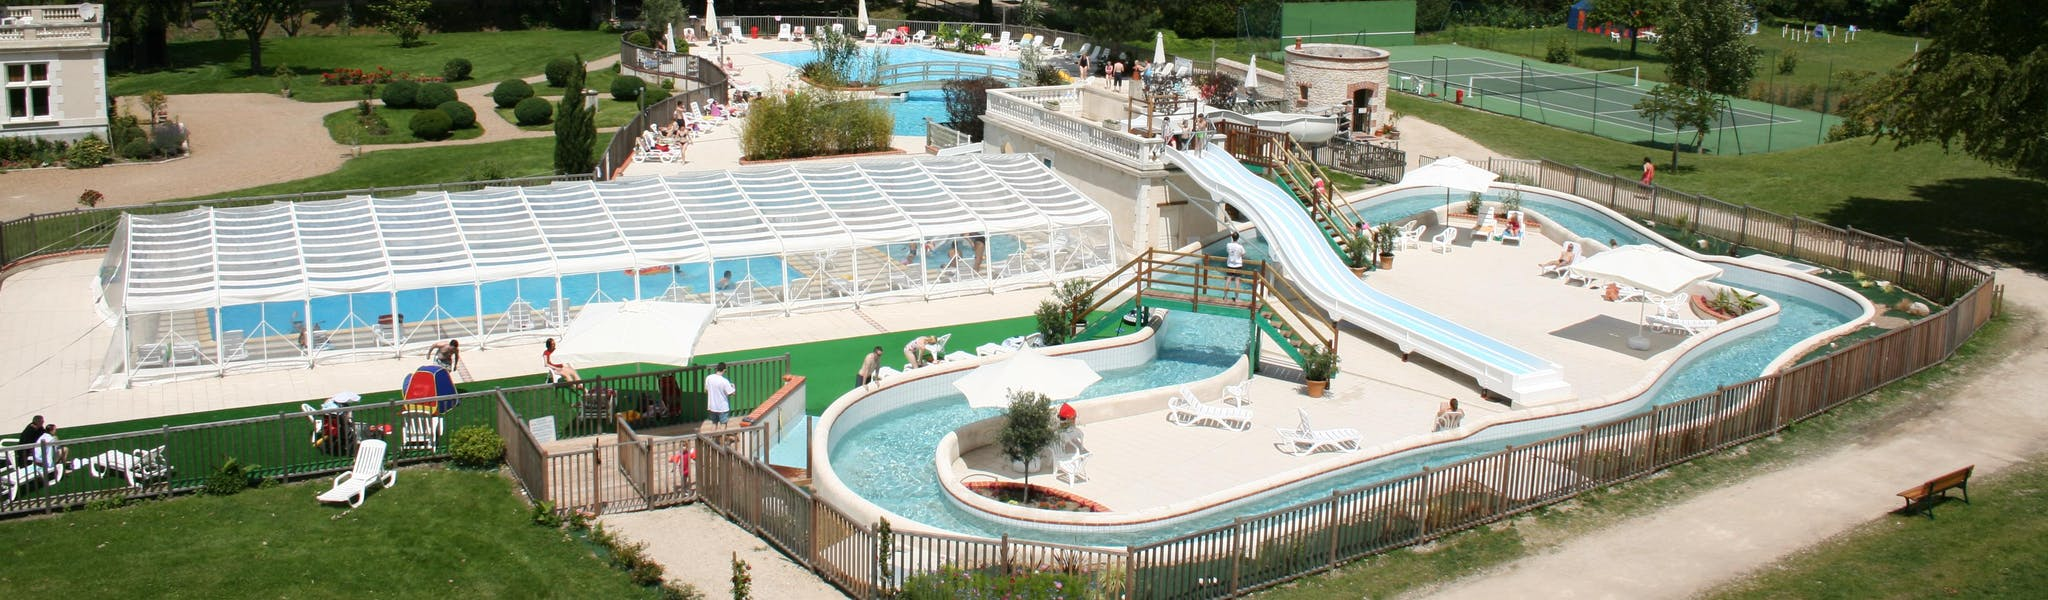 chteau-des-marais zwembad overzicht